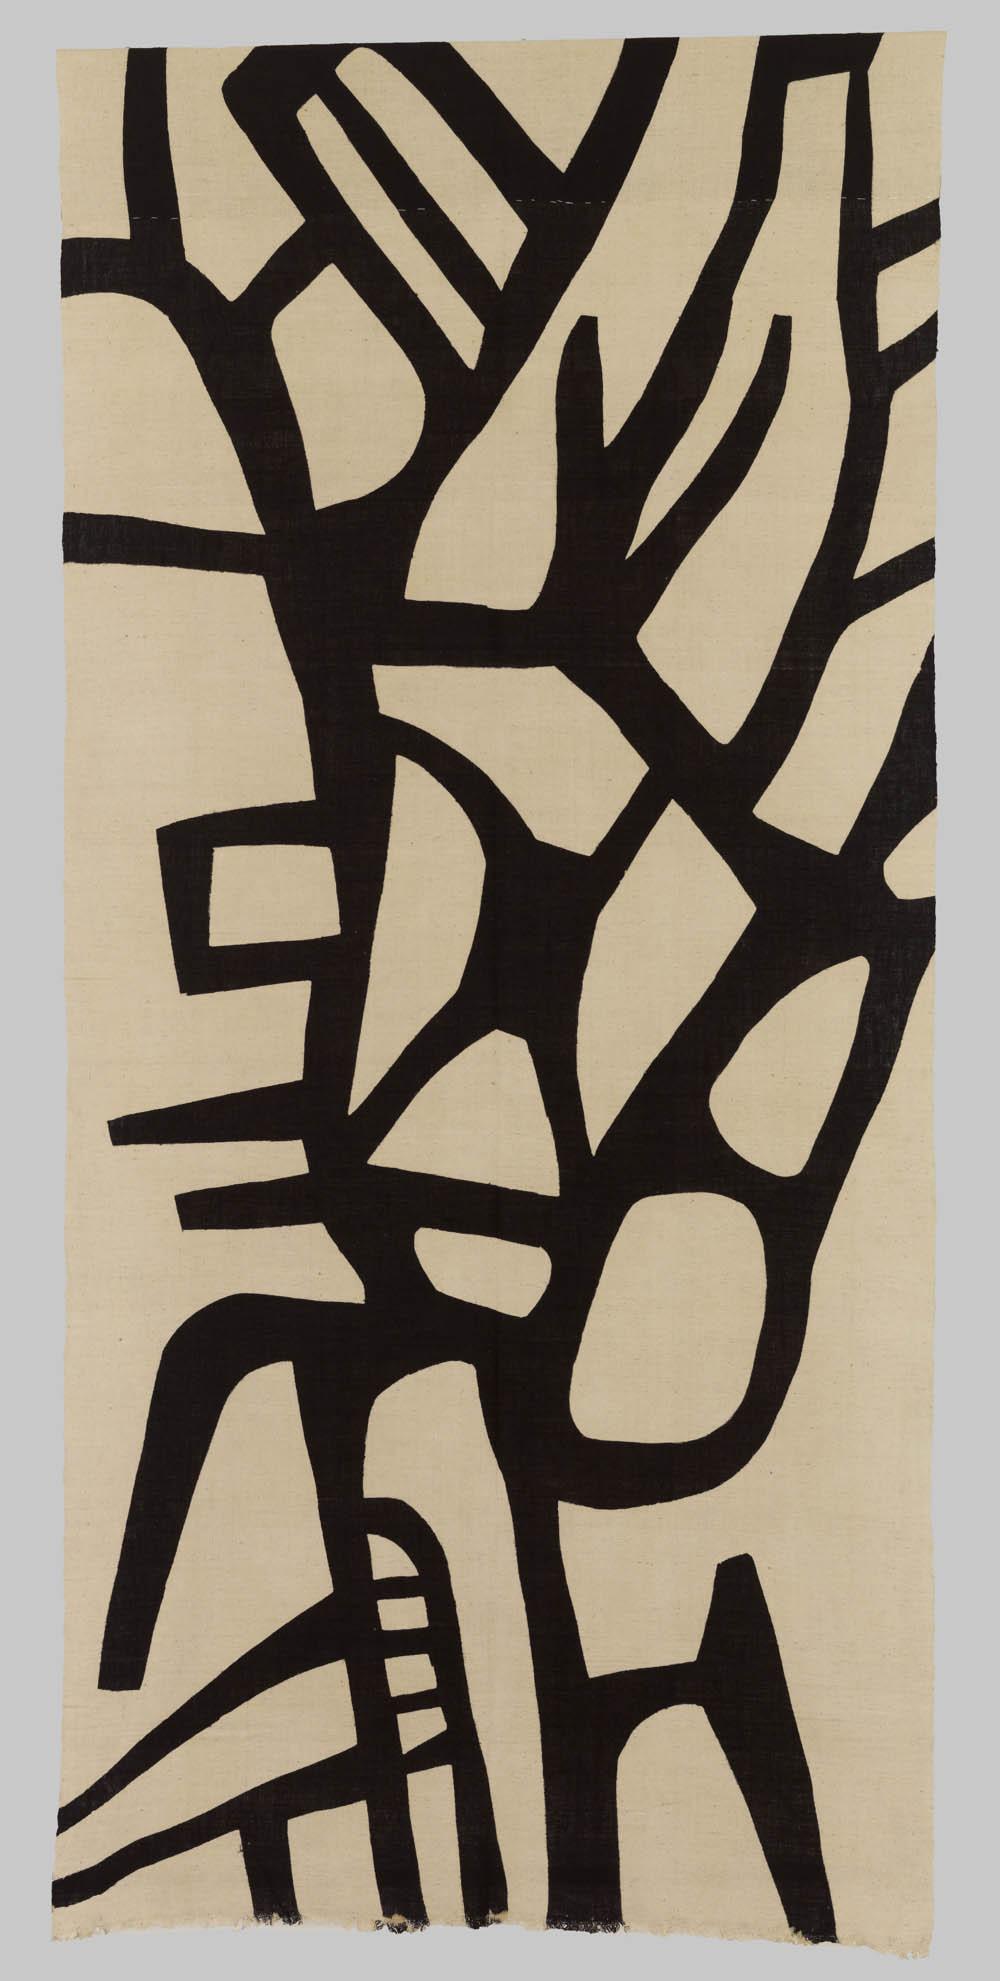 Untitled, 2007, Katazome dyed cotton, 275 x 130 cm, Don Samirō Yunoki, 2013 - MA 12585, © Paris, RMN - Grand Palais (Musée Guimet, Paris) / Thierry Ollivier